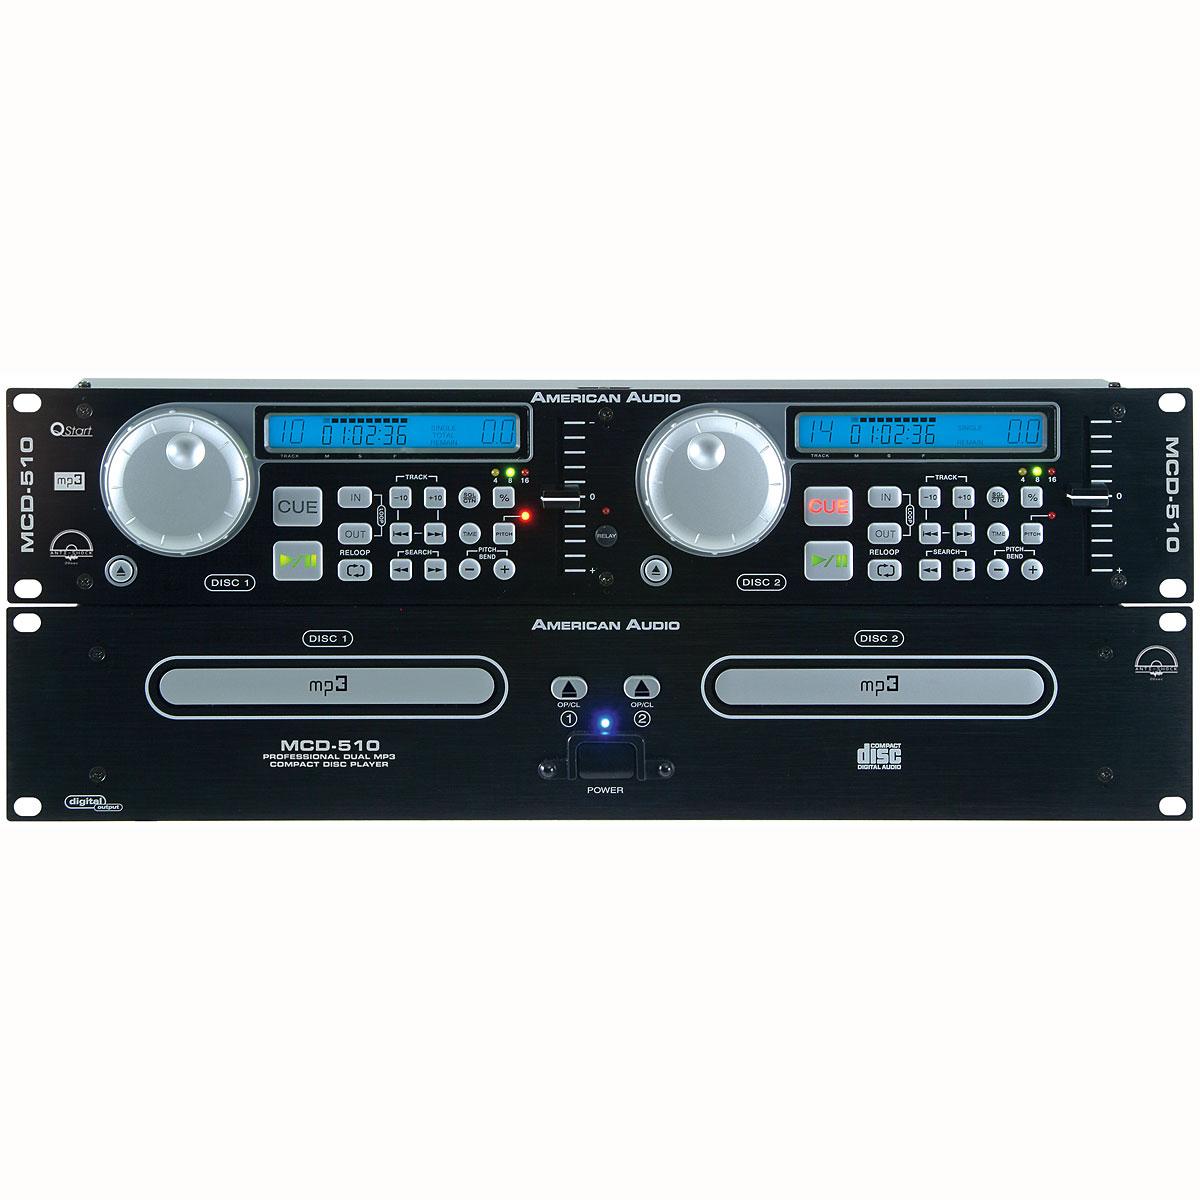 American Audio Pro Dual Bay CD/MP3 Player